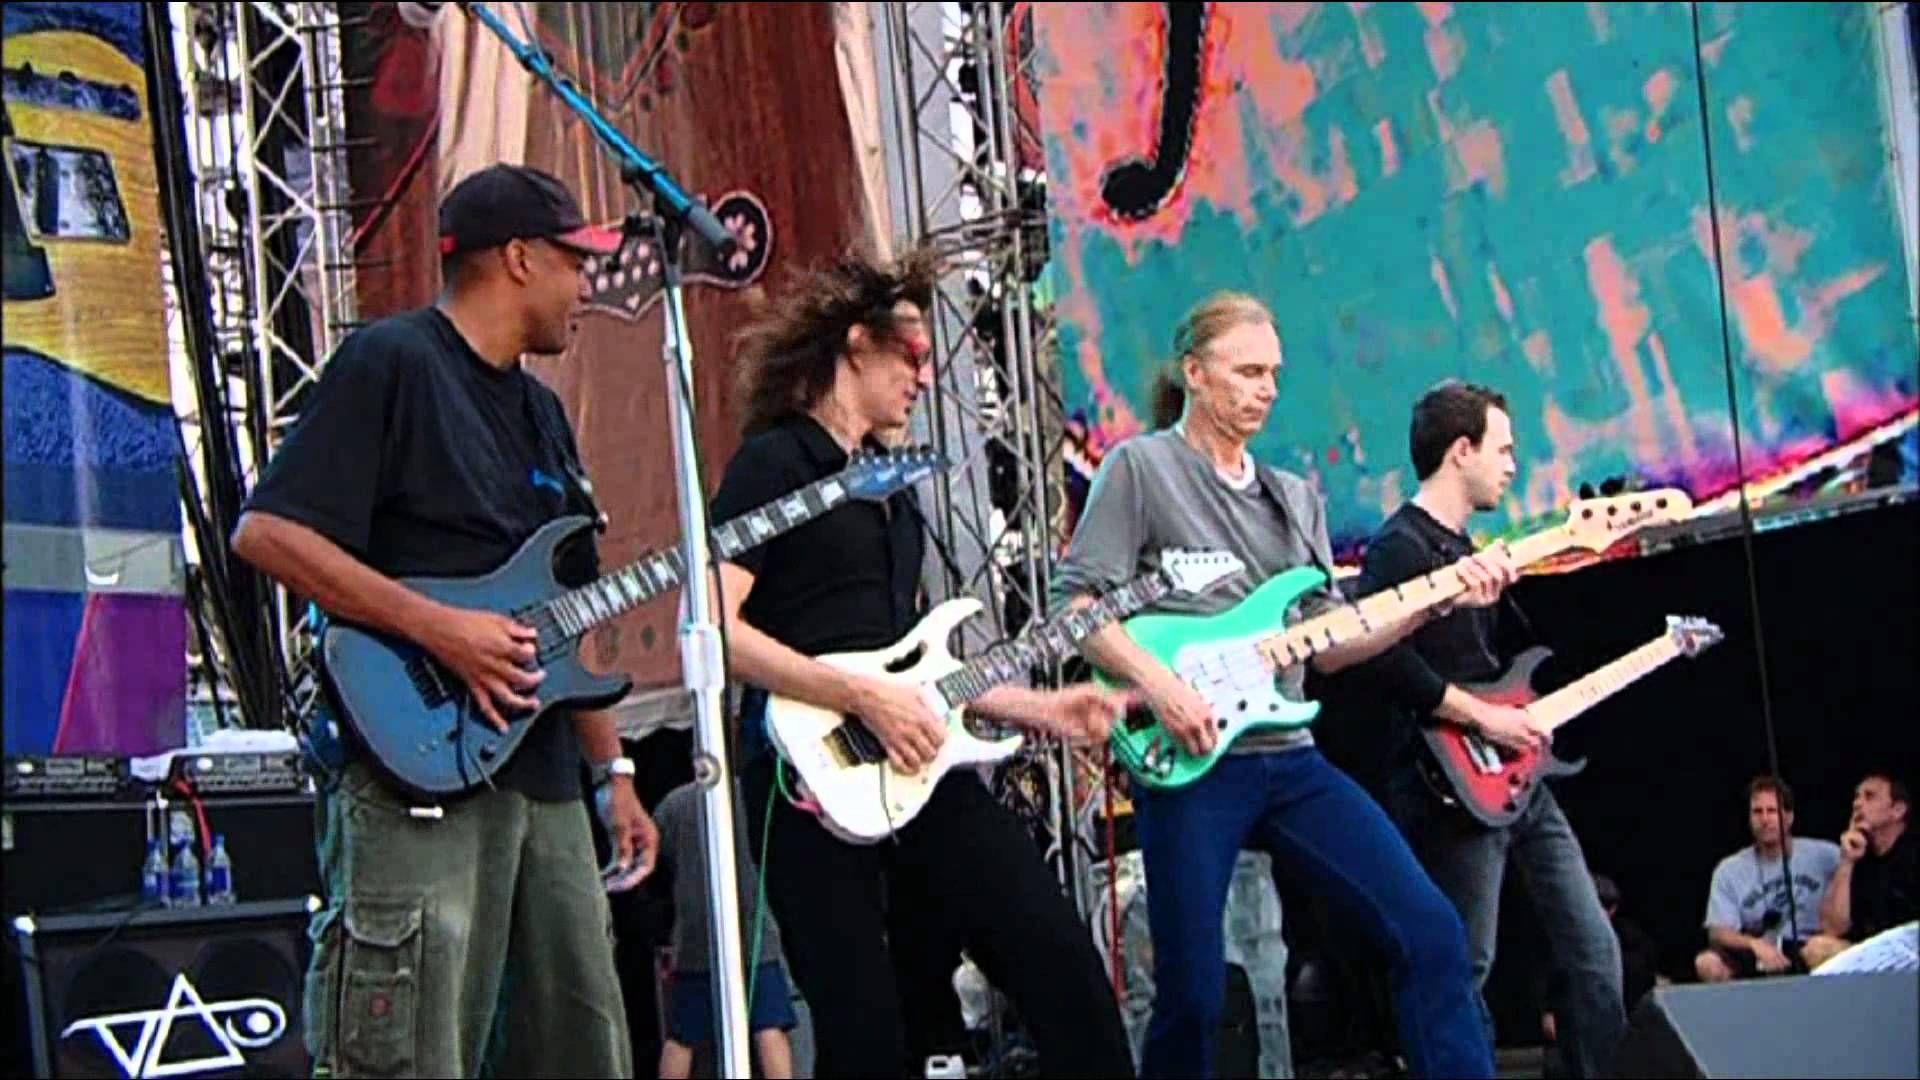 Steve Vai Incredible Guitar Performance Hd Steve Vai Billy Sheehan Tony